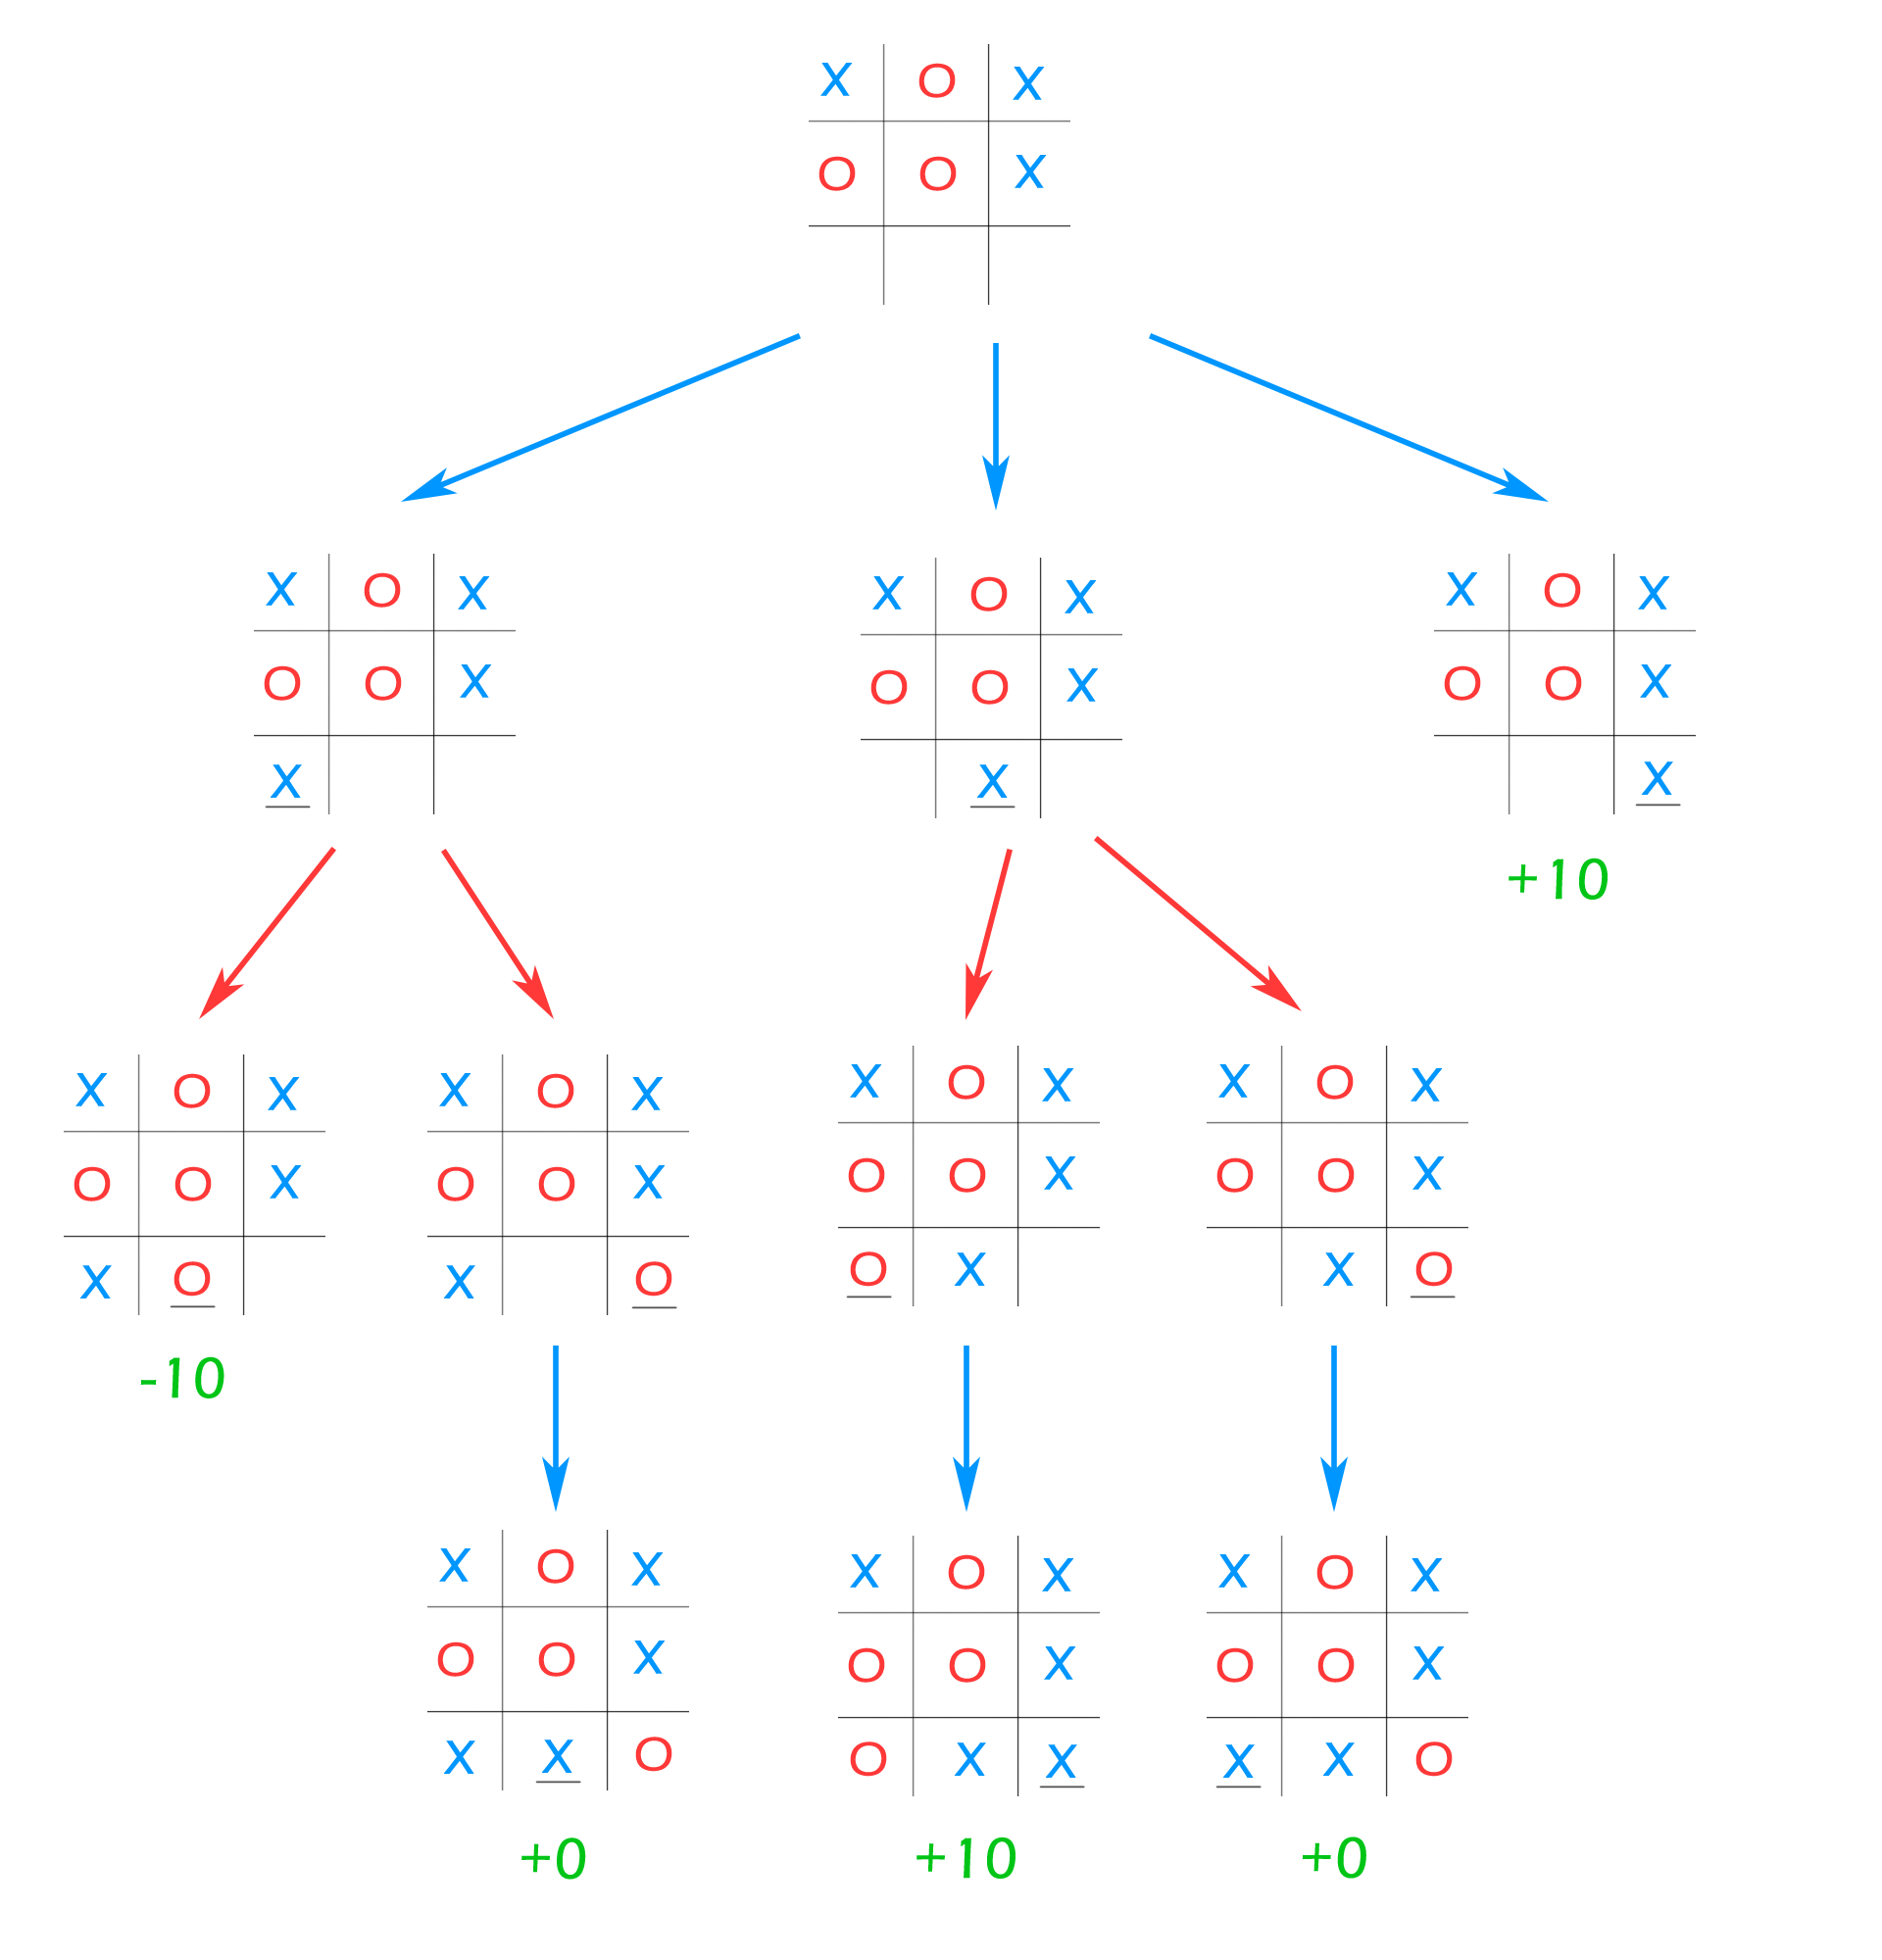 Tic-Tac-Toe Game Tree